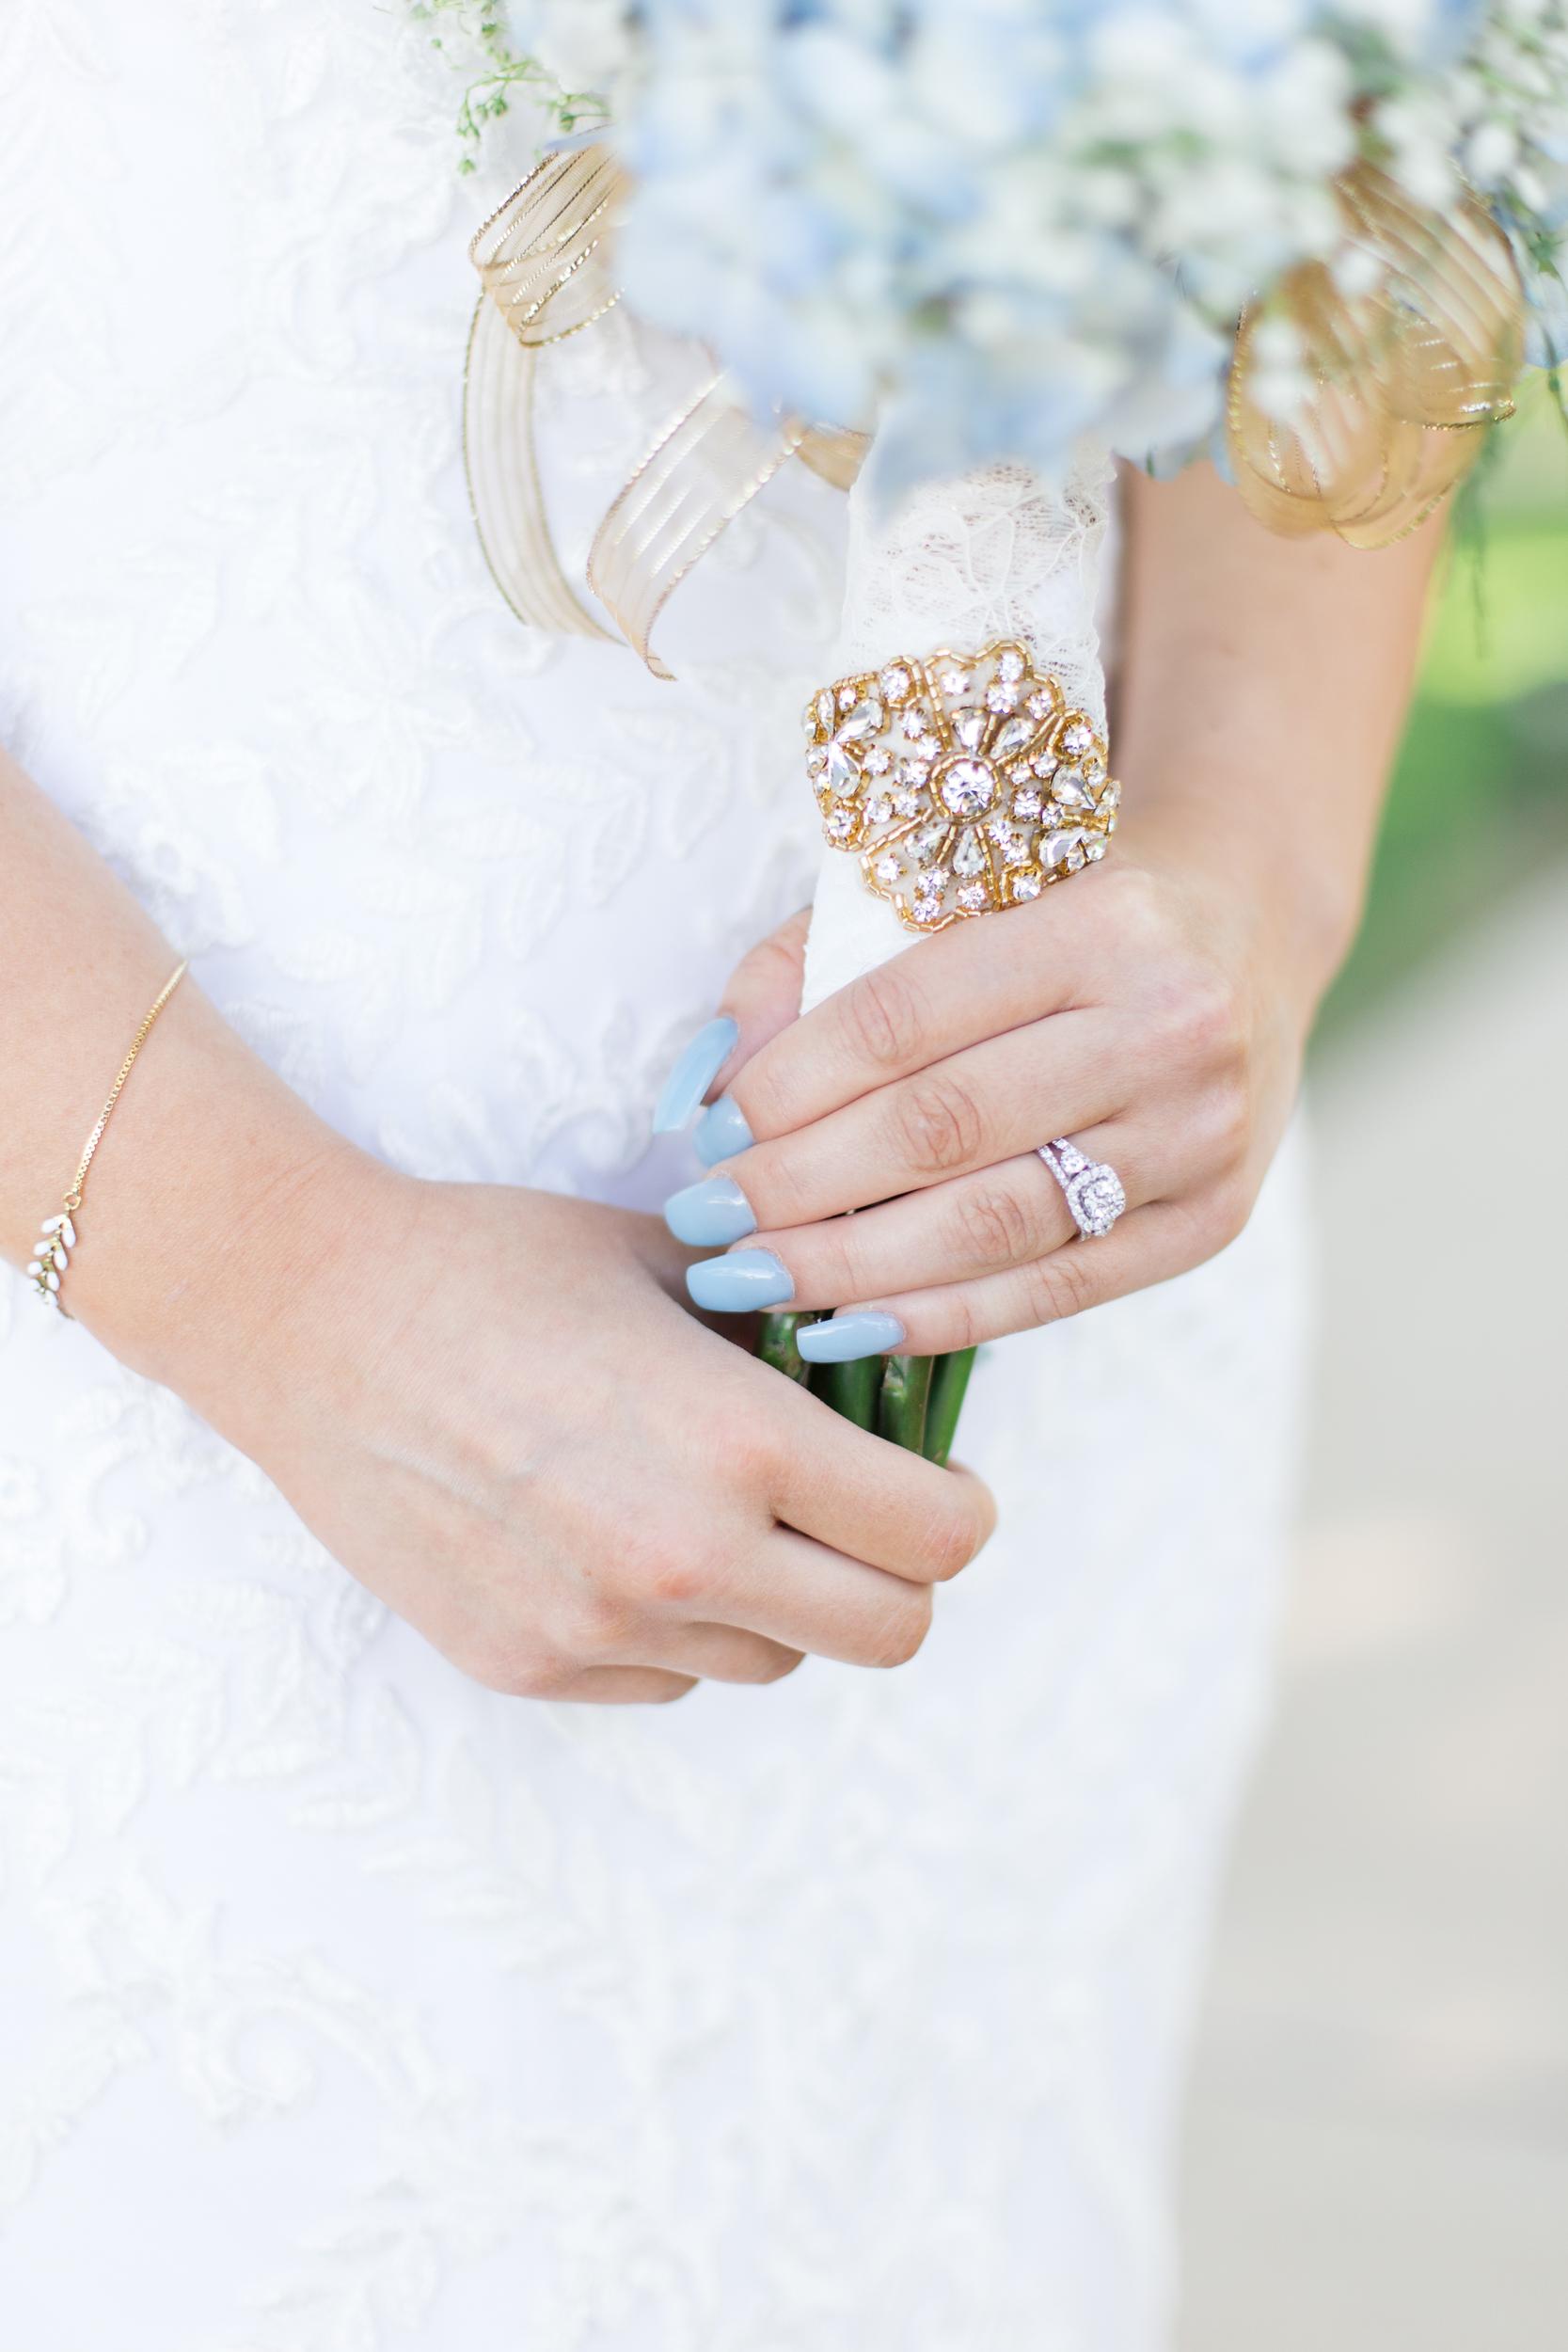 Zihlman-East TX Wedding_Kelsie Hendricks Photography_The Folmar Tyler Texas-76.jpg